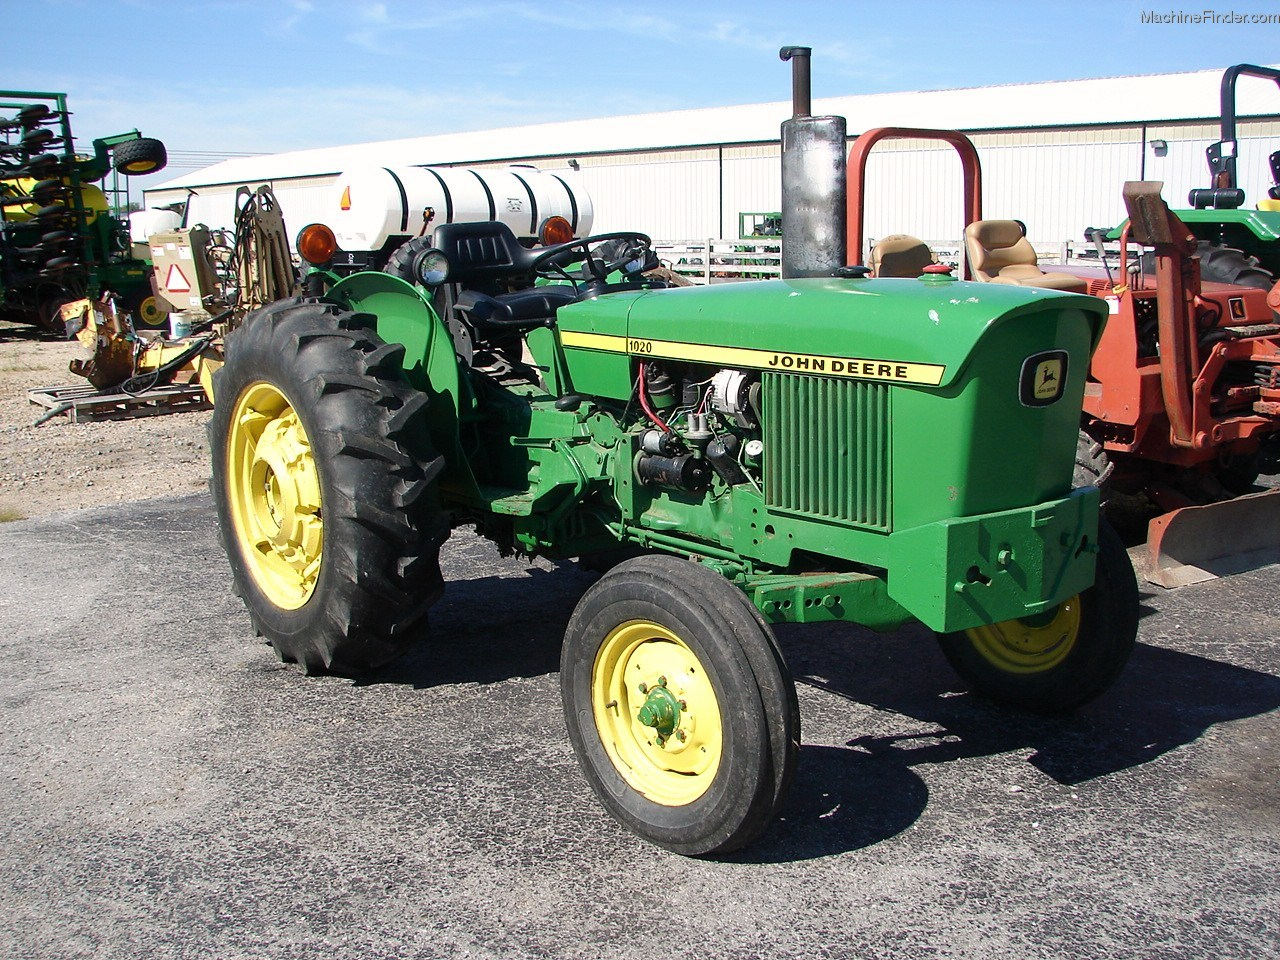 1972 John Deere 1020 Tractors - Utility (40-100hp) - John ...